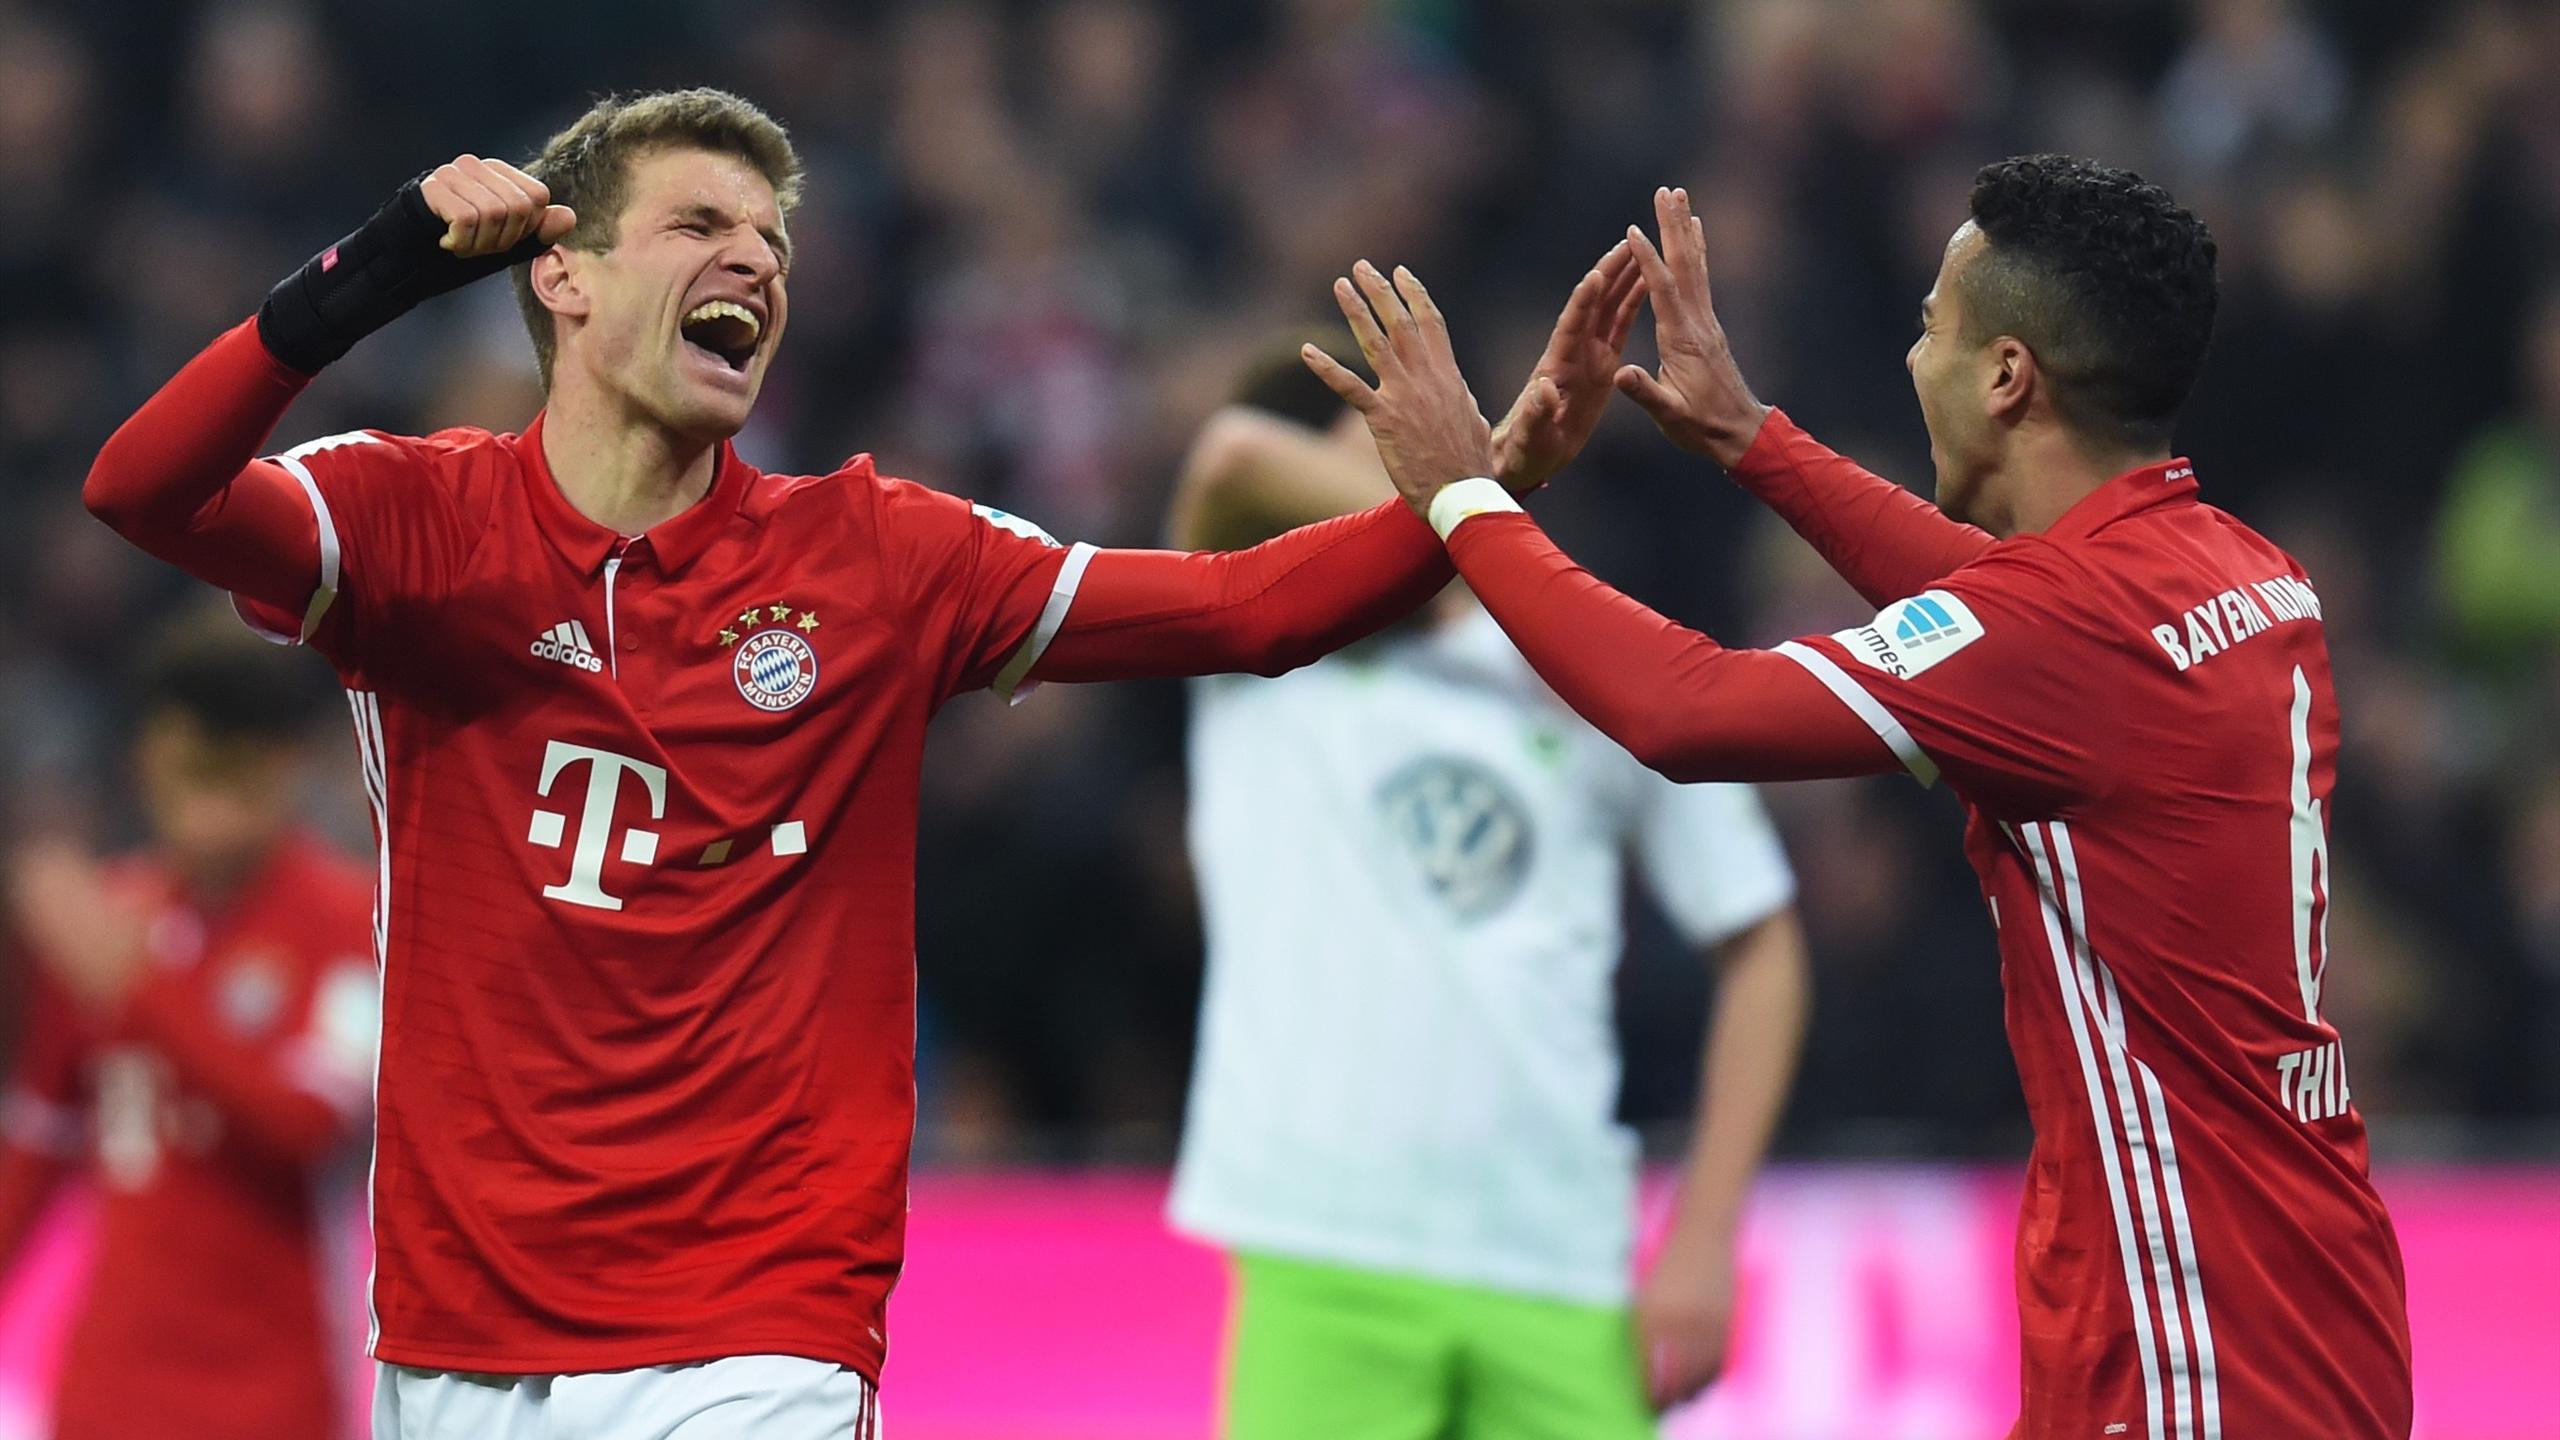 Thomas Müller (Bayern Munich) a enfin marqué en Bundesliga contre Wolfsbourg